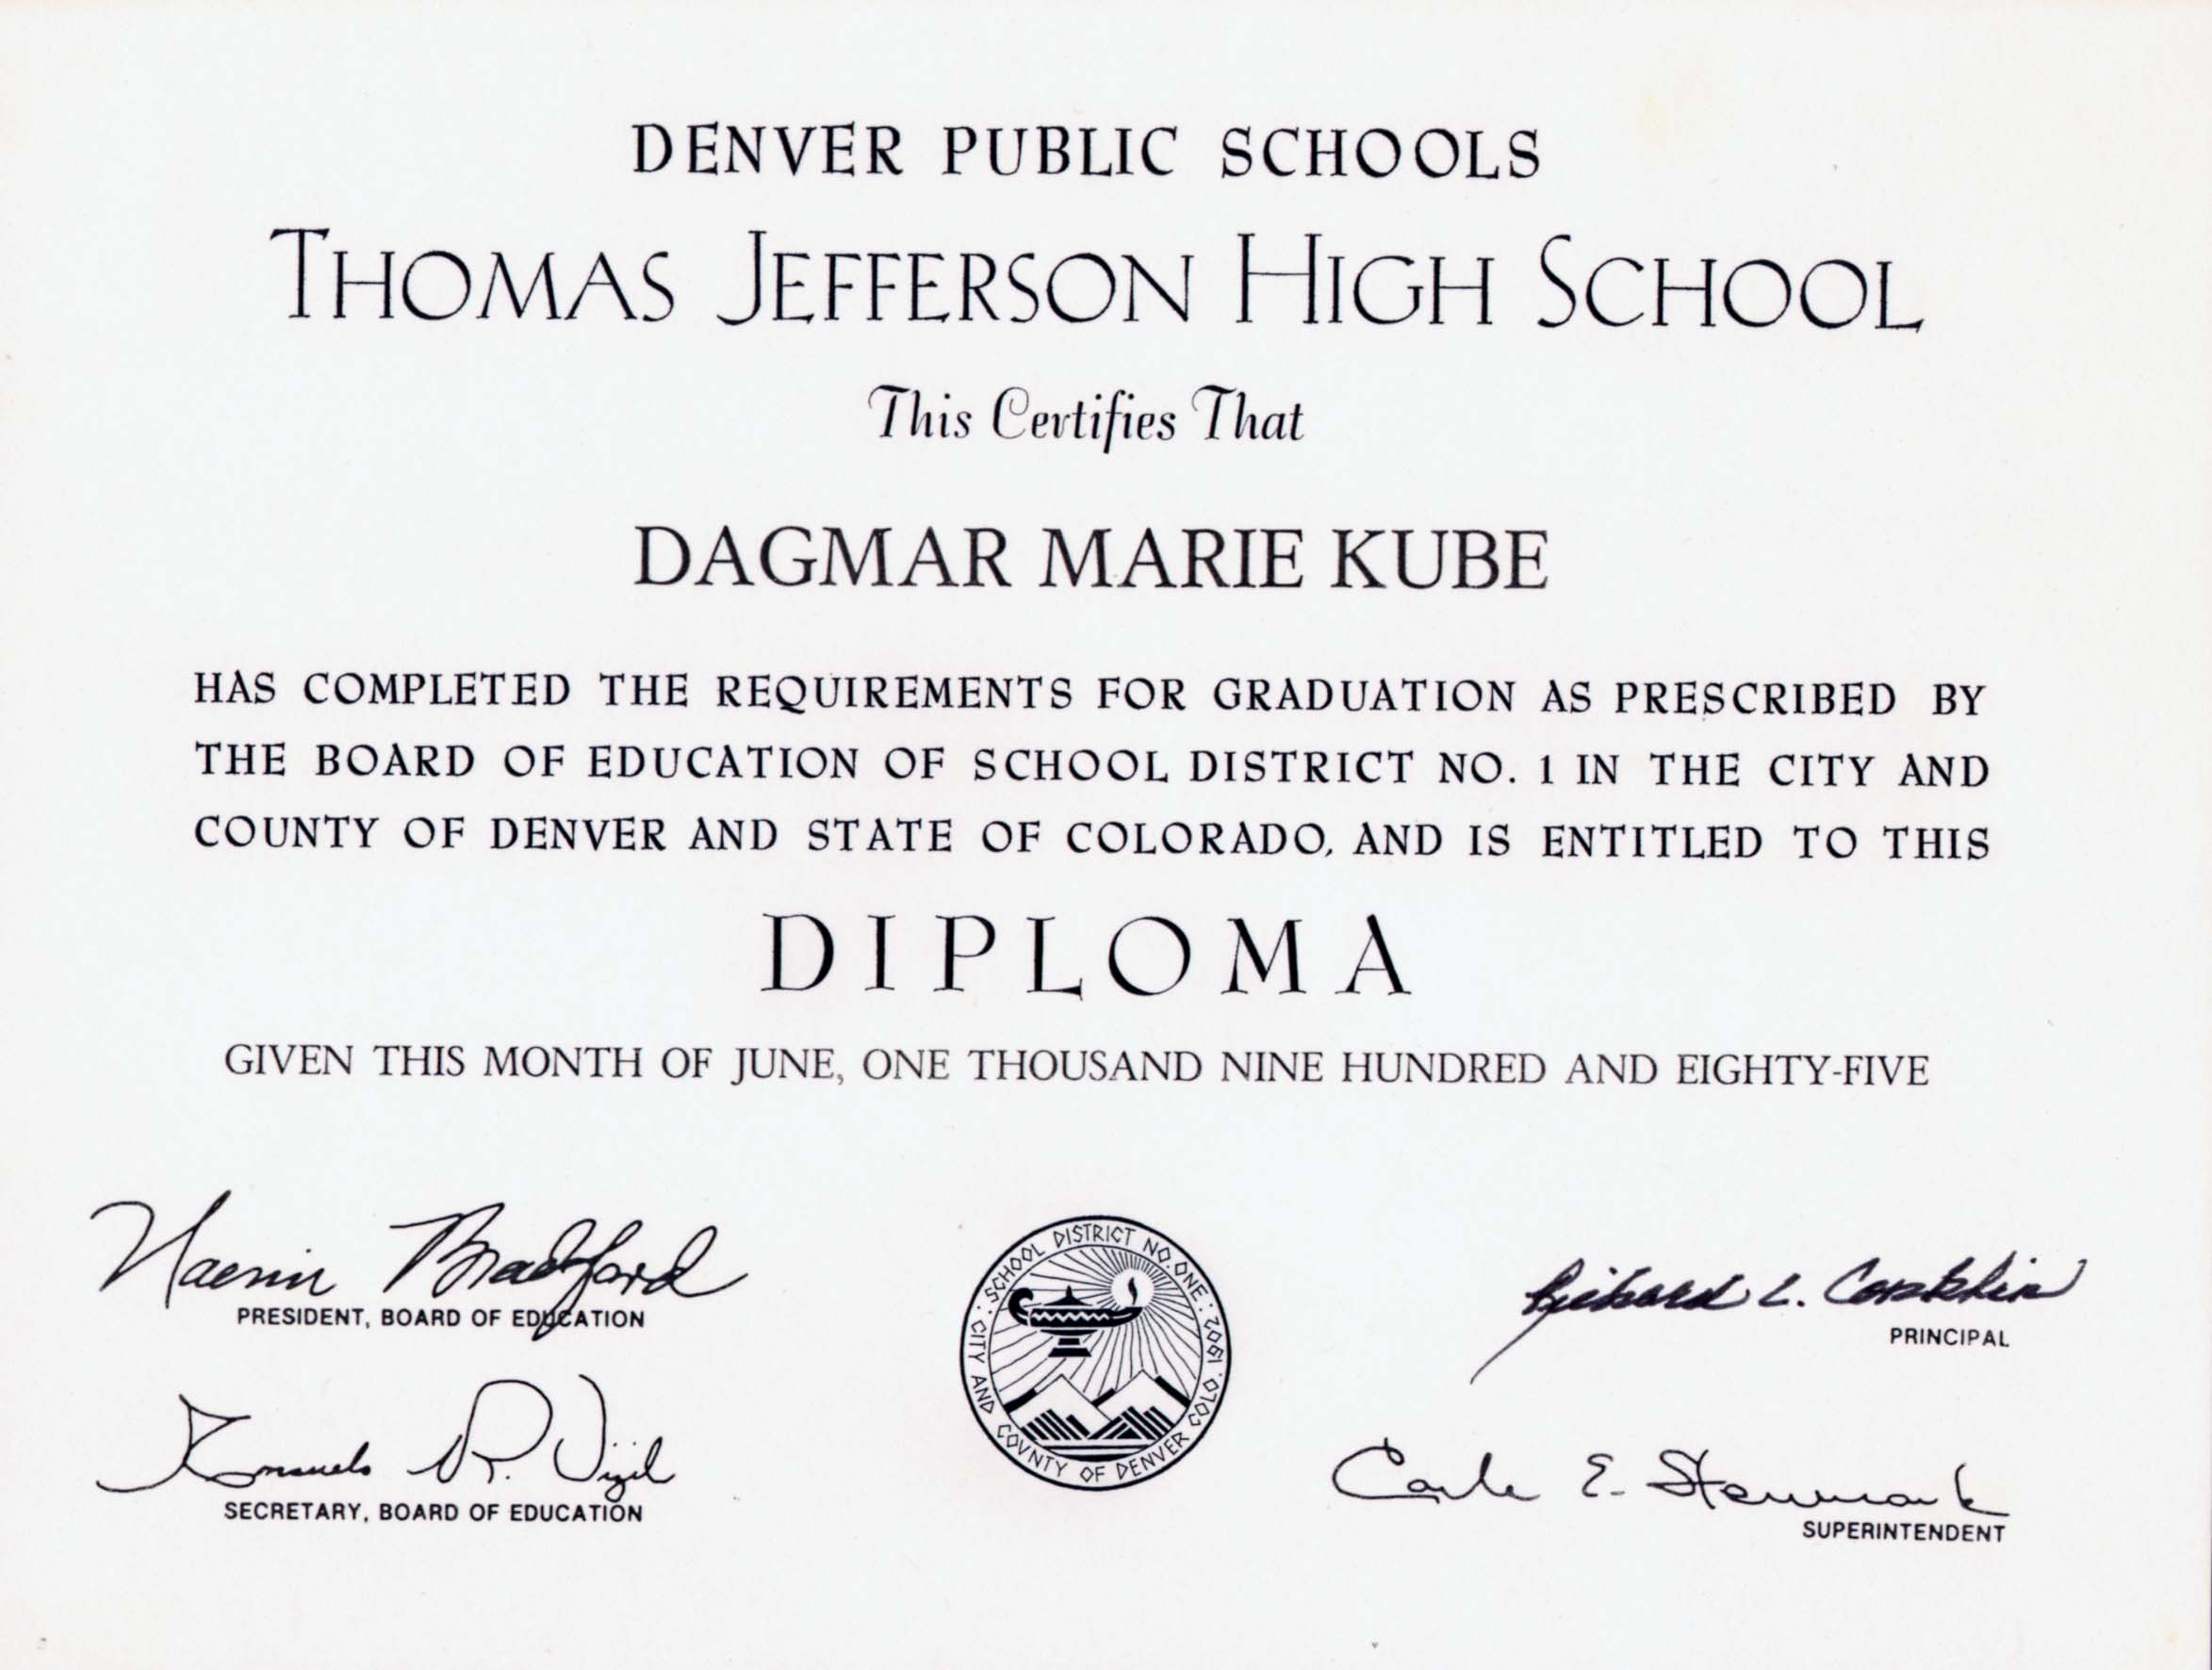 High School Diploma rotated Medium.JPG